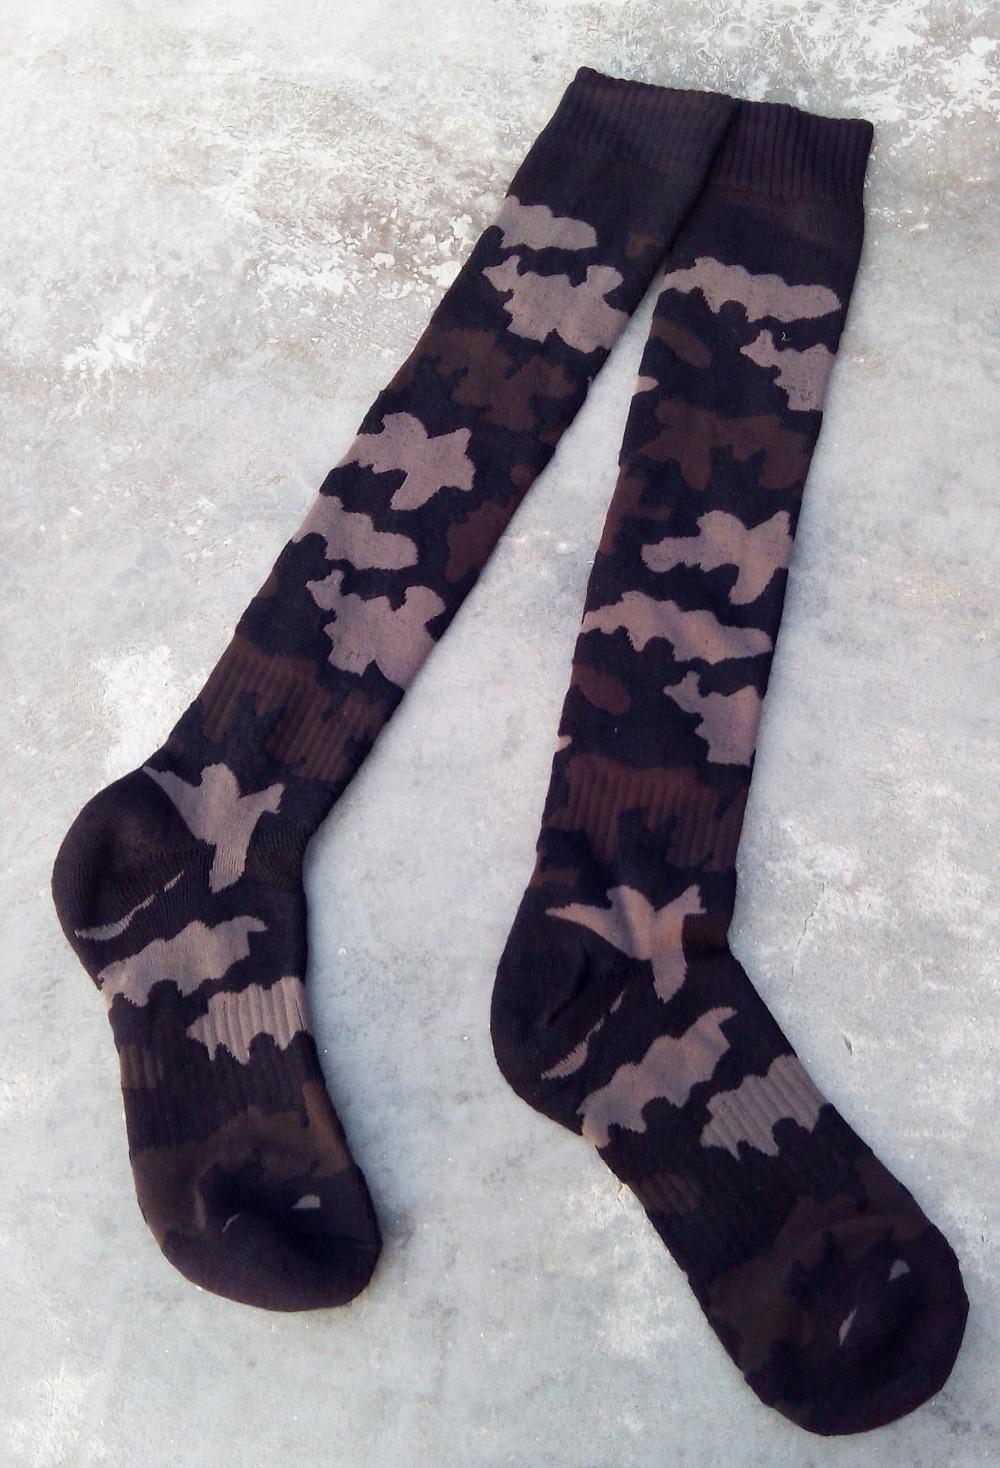 New camo knee high long basketball Knitting towel bottom ski socks outdoor skateboard men's sport socks cheap wholesale 367w(China (Mainland))